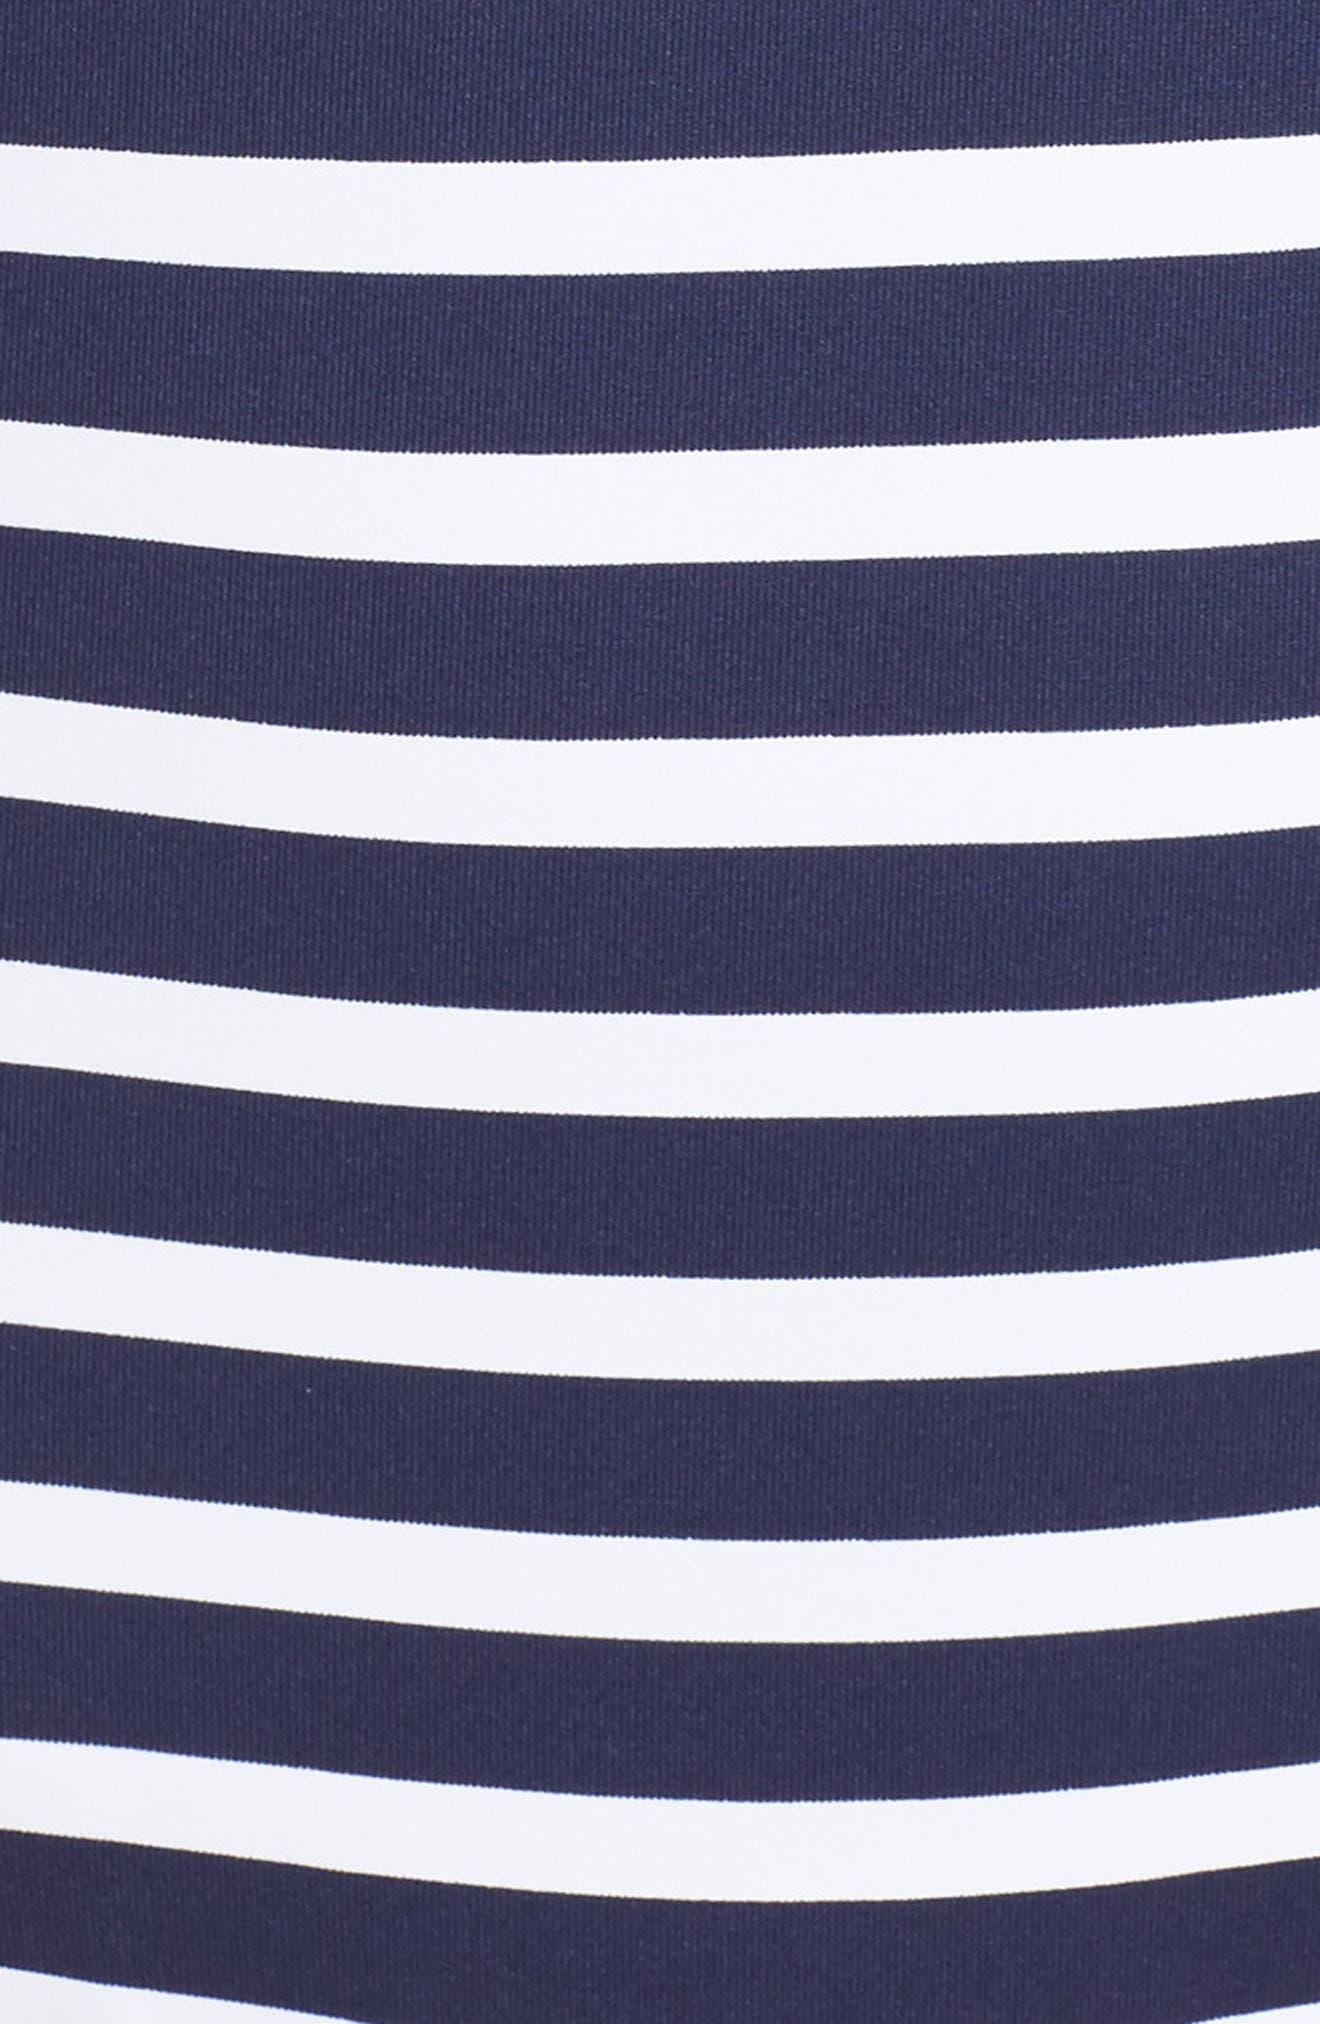 Breton Stripe One-Piece Swimsuit,                             Alternate thumbnail 5, color,                             400